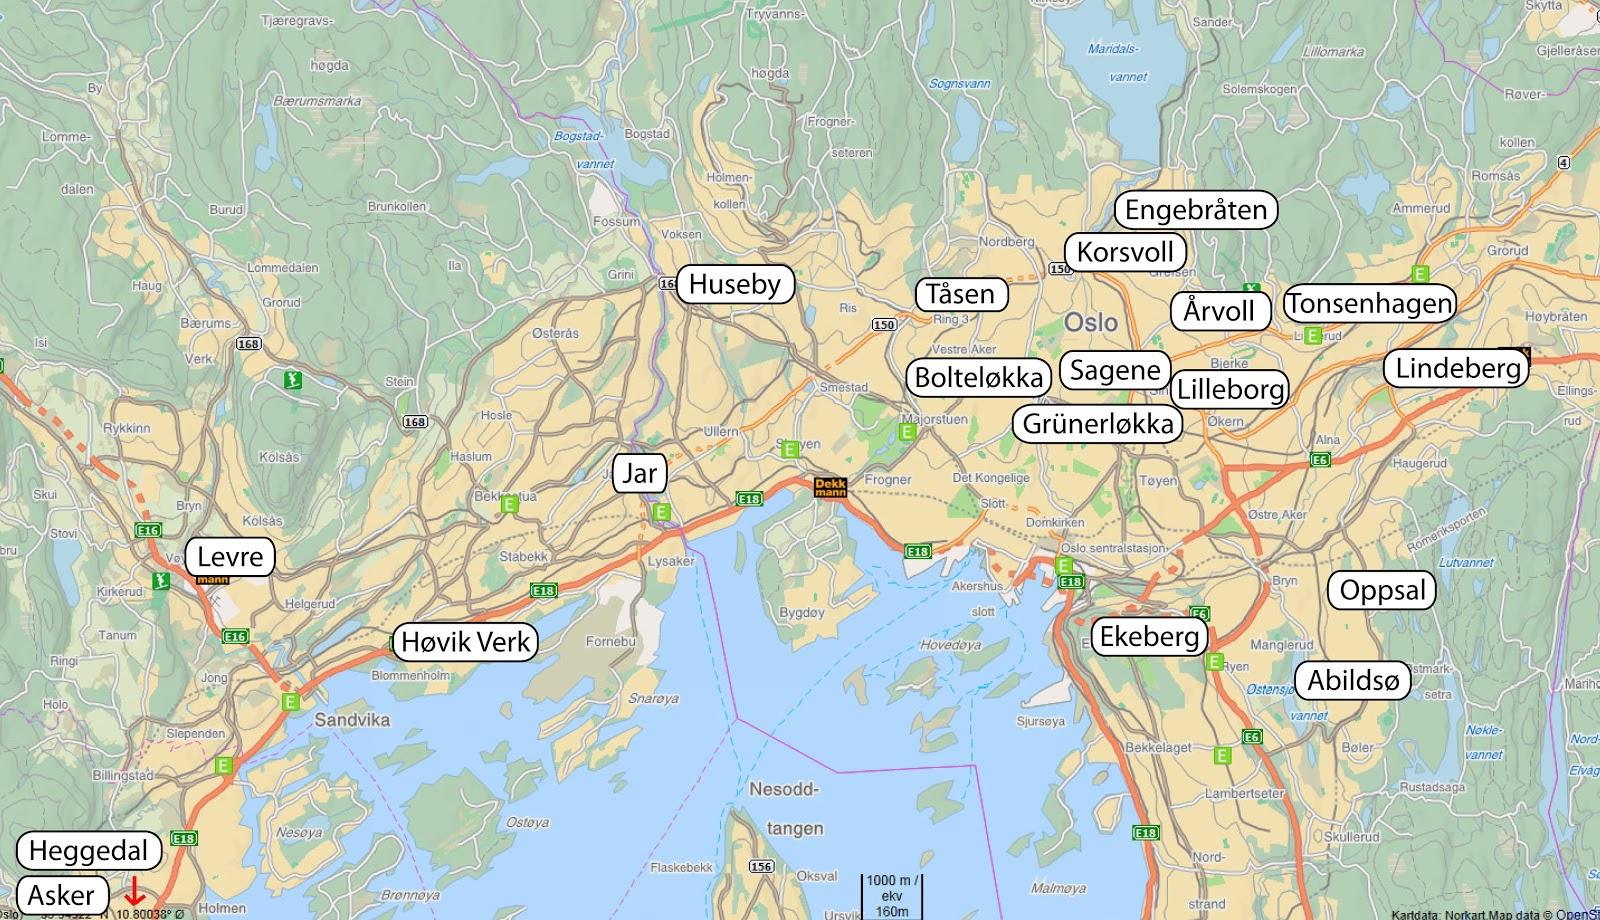 kart københavn og omegn Loppislife: Kart over helgens loppiser kart københavn og omegn